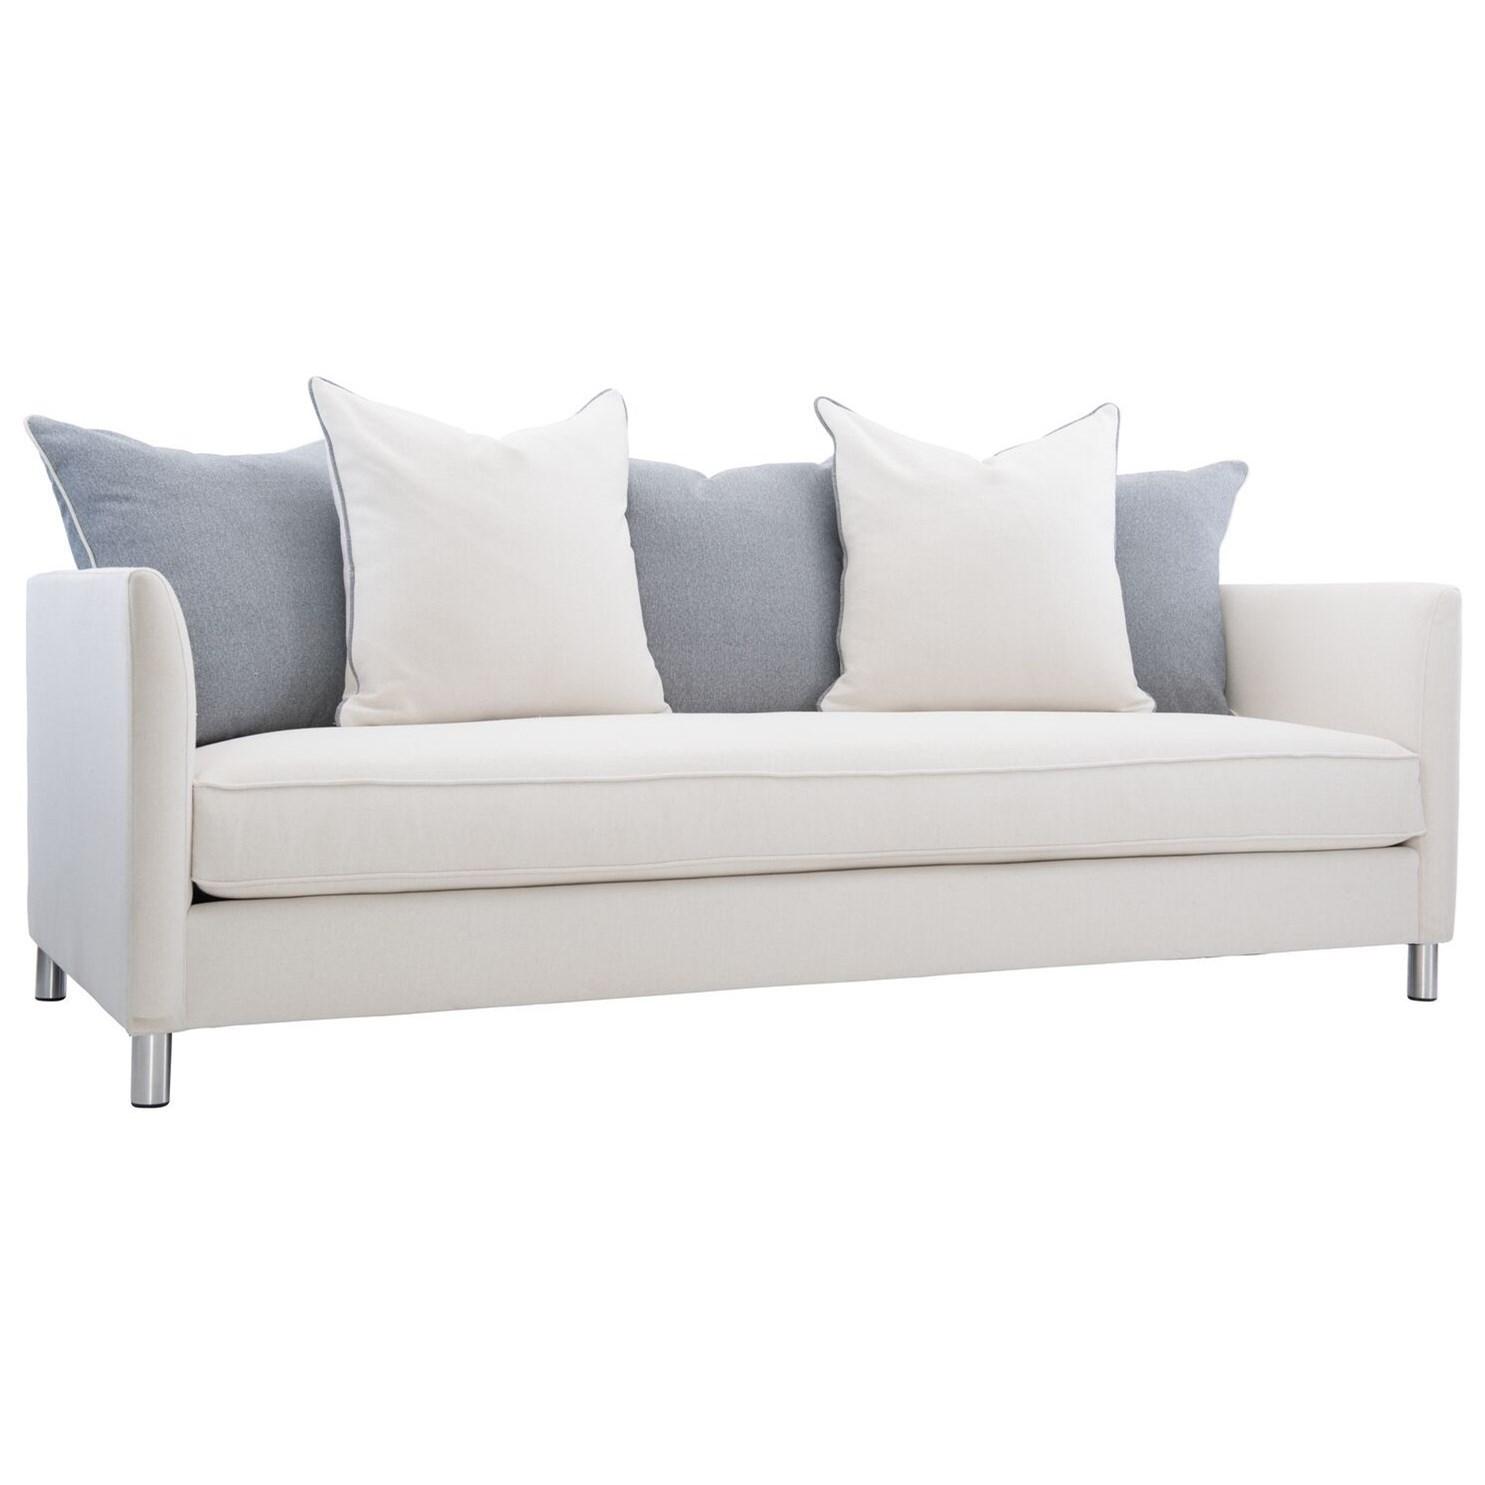 Exteriors - Taylor Outdoor/Indoor Sofa at Williams & Kay